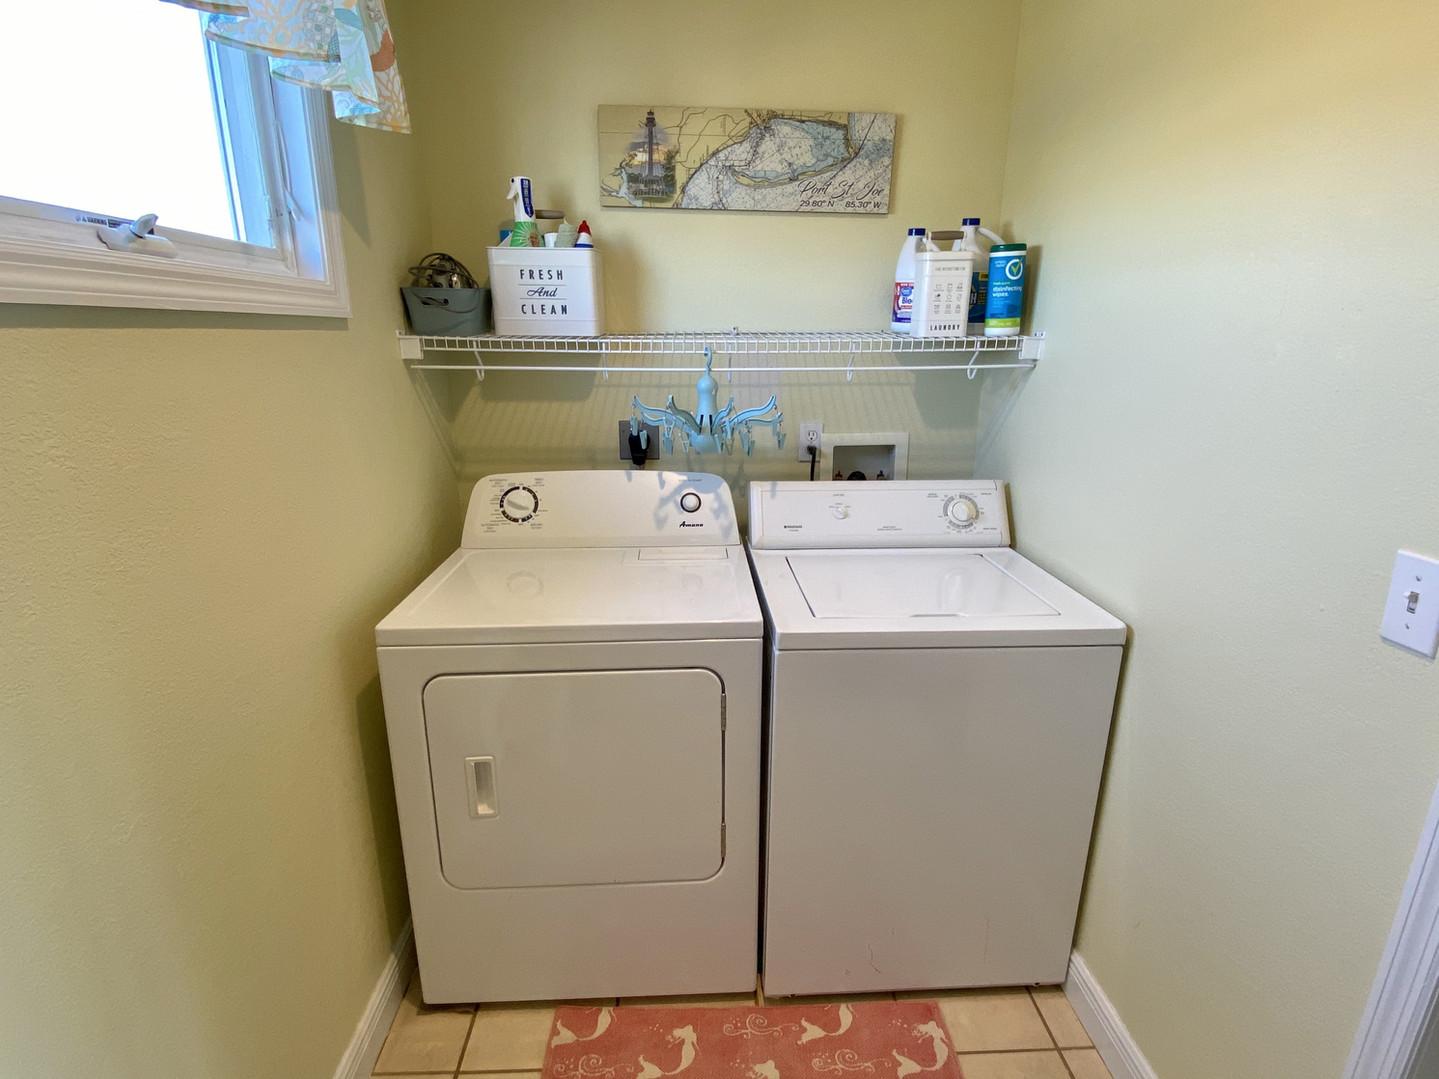 Laundry room on second floor